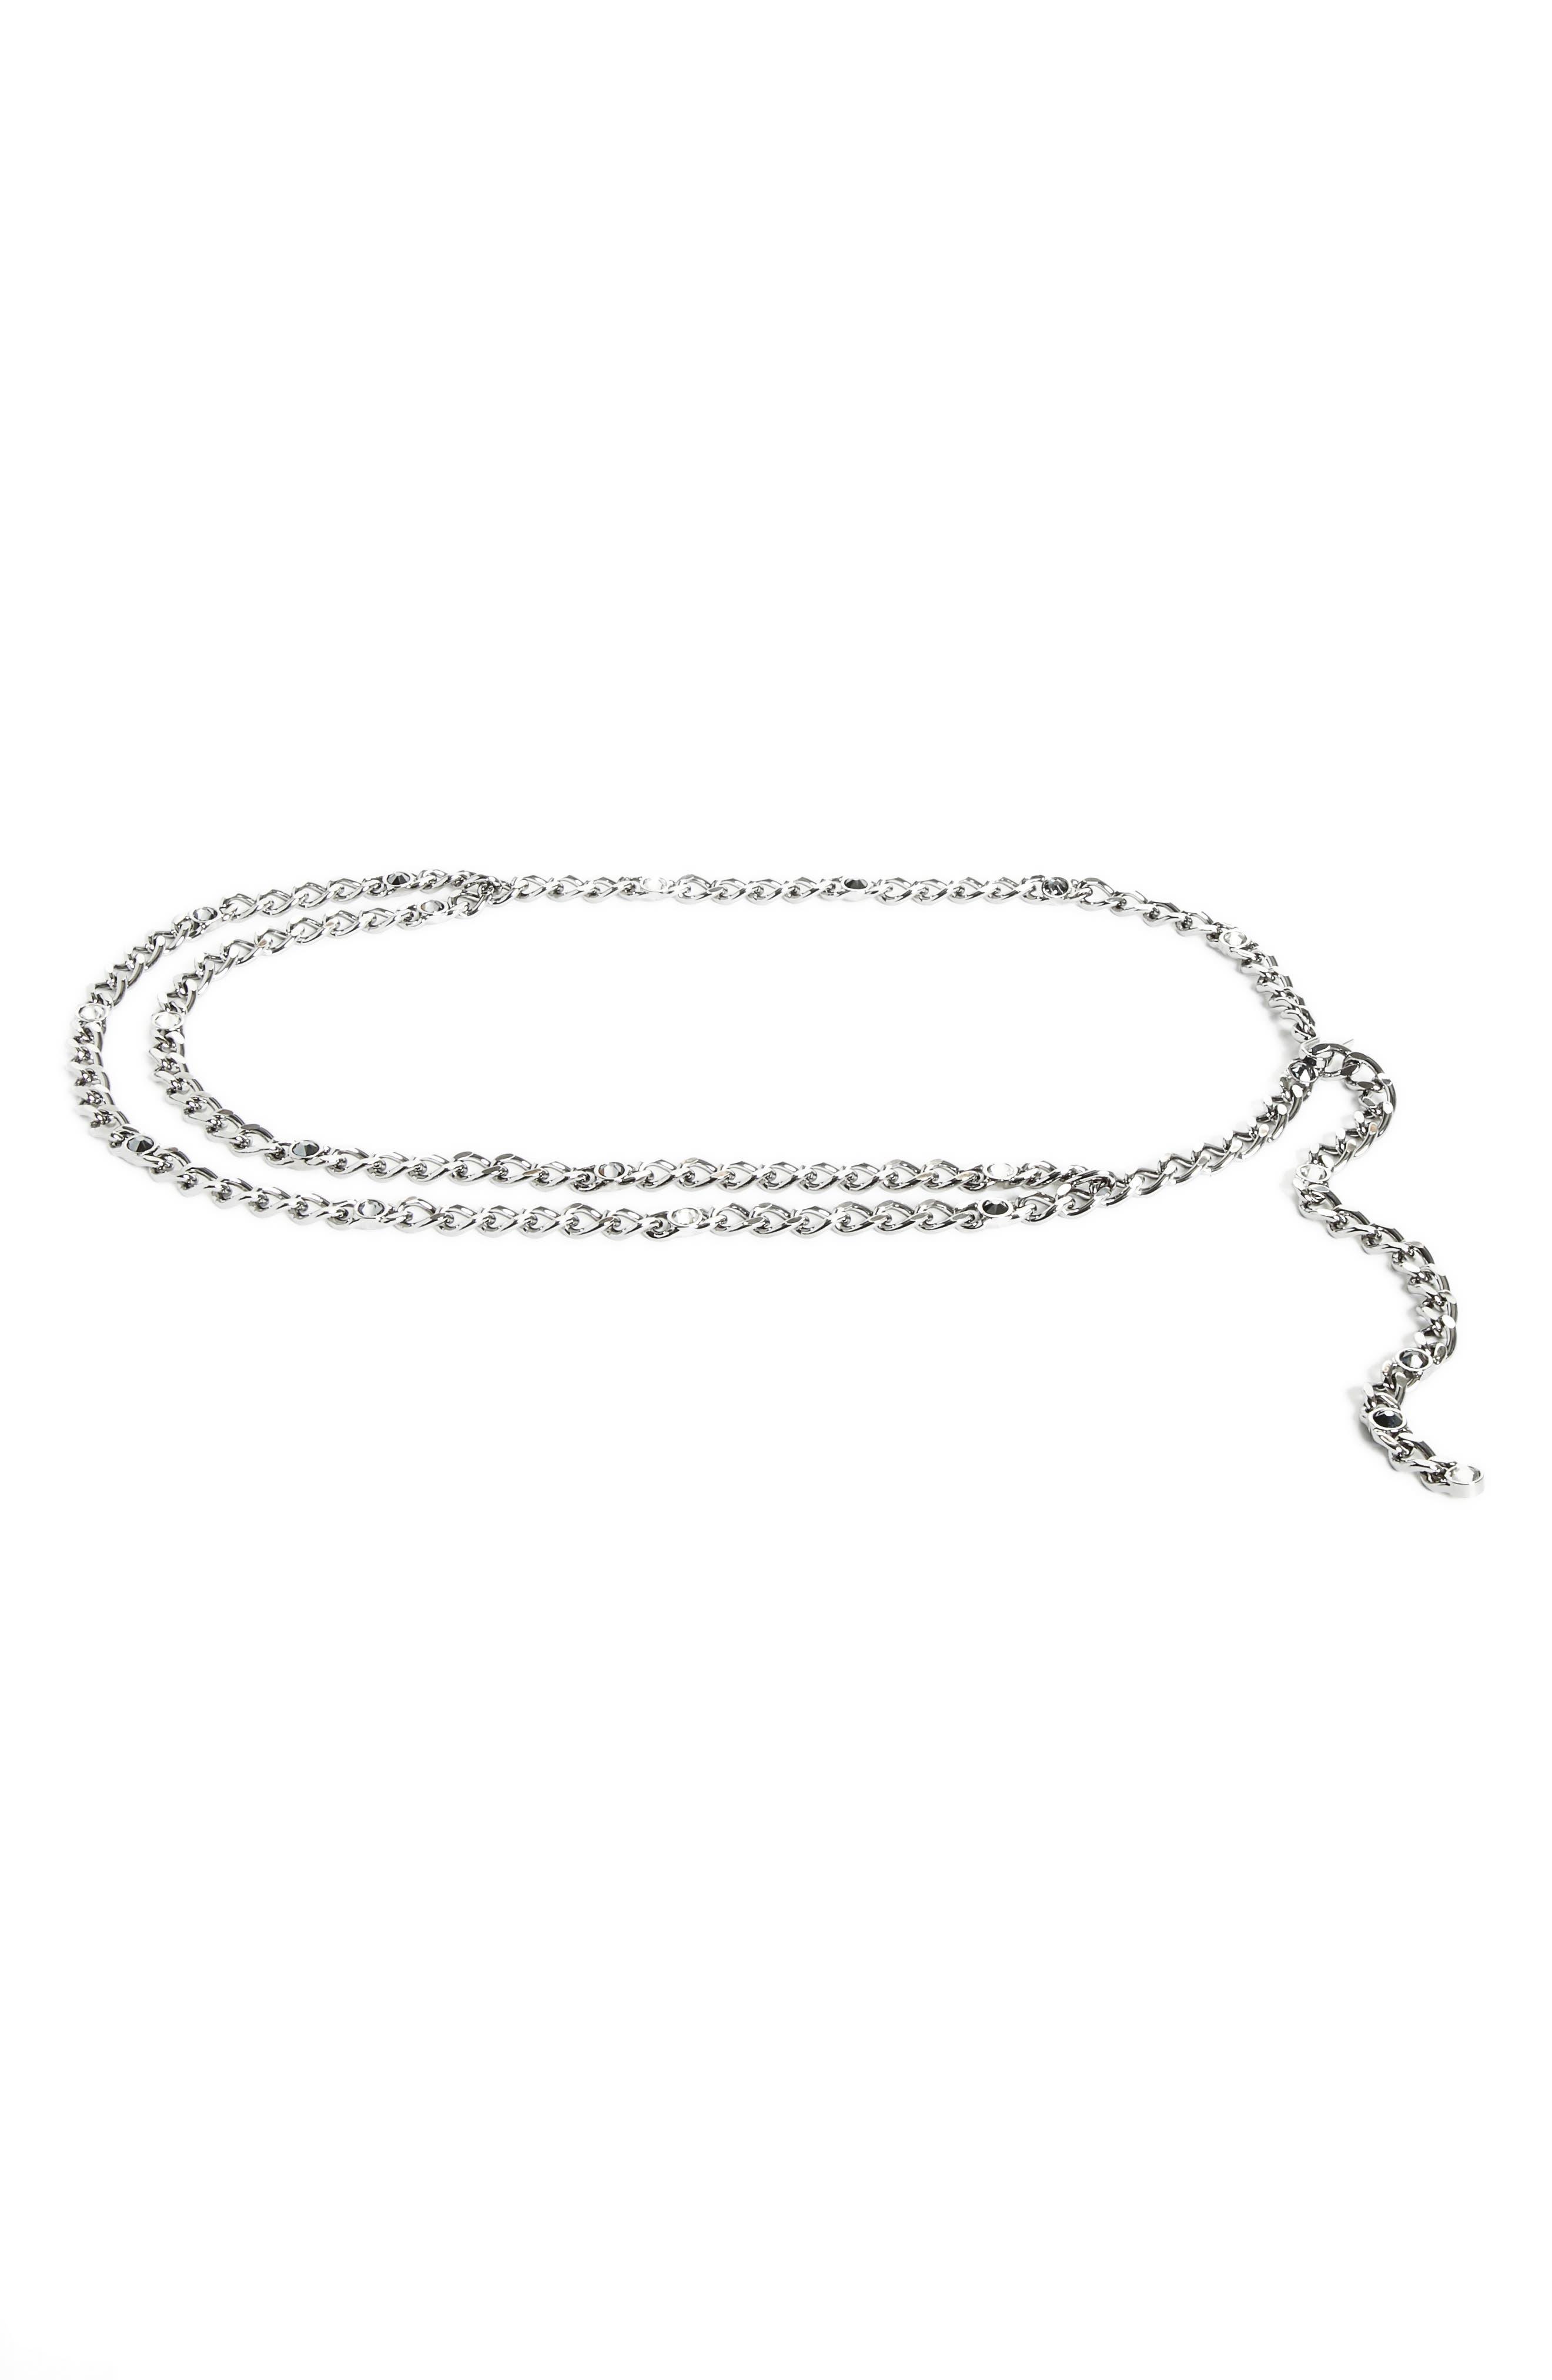 Swarovski Crystal Chain Belt,                         Main,                         color, Ruthenium Jet Hermatite